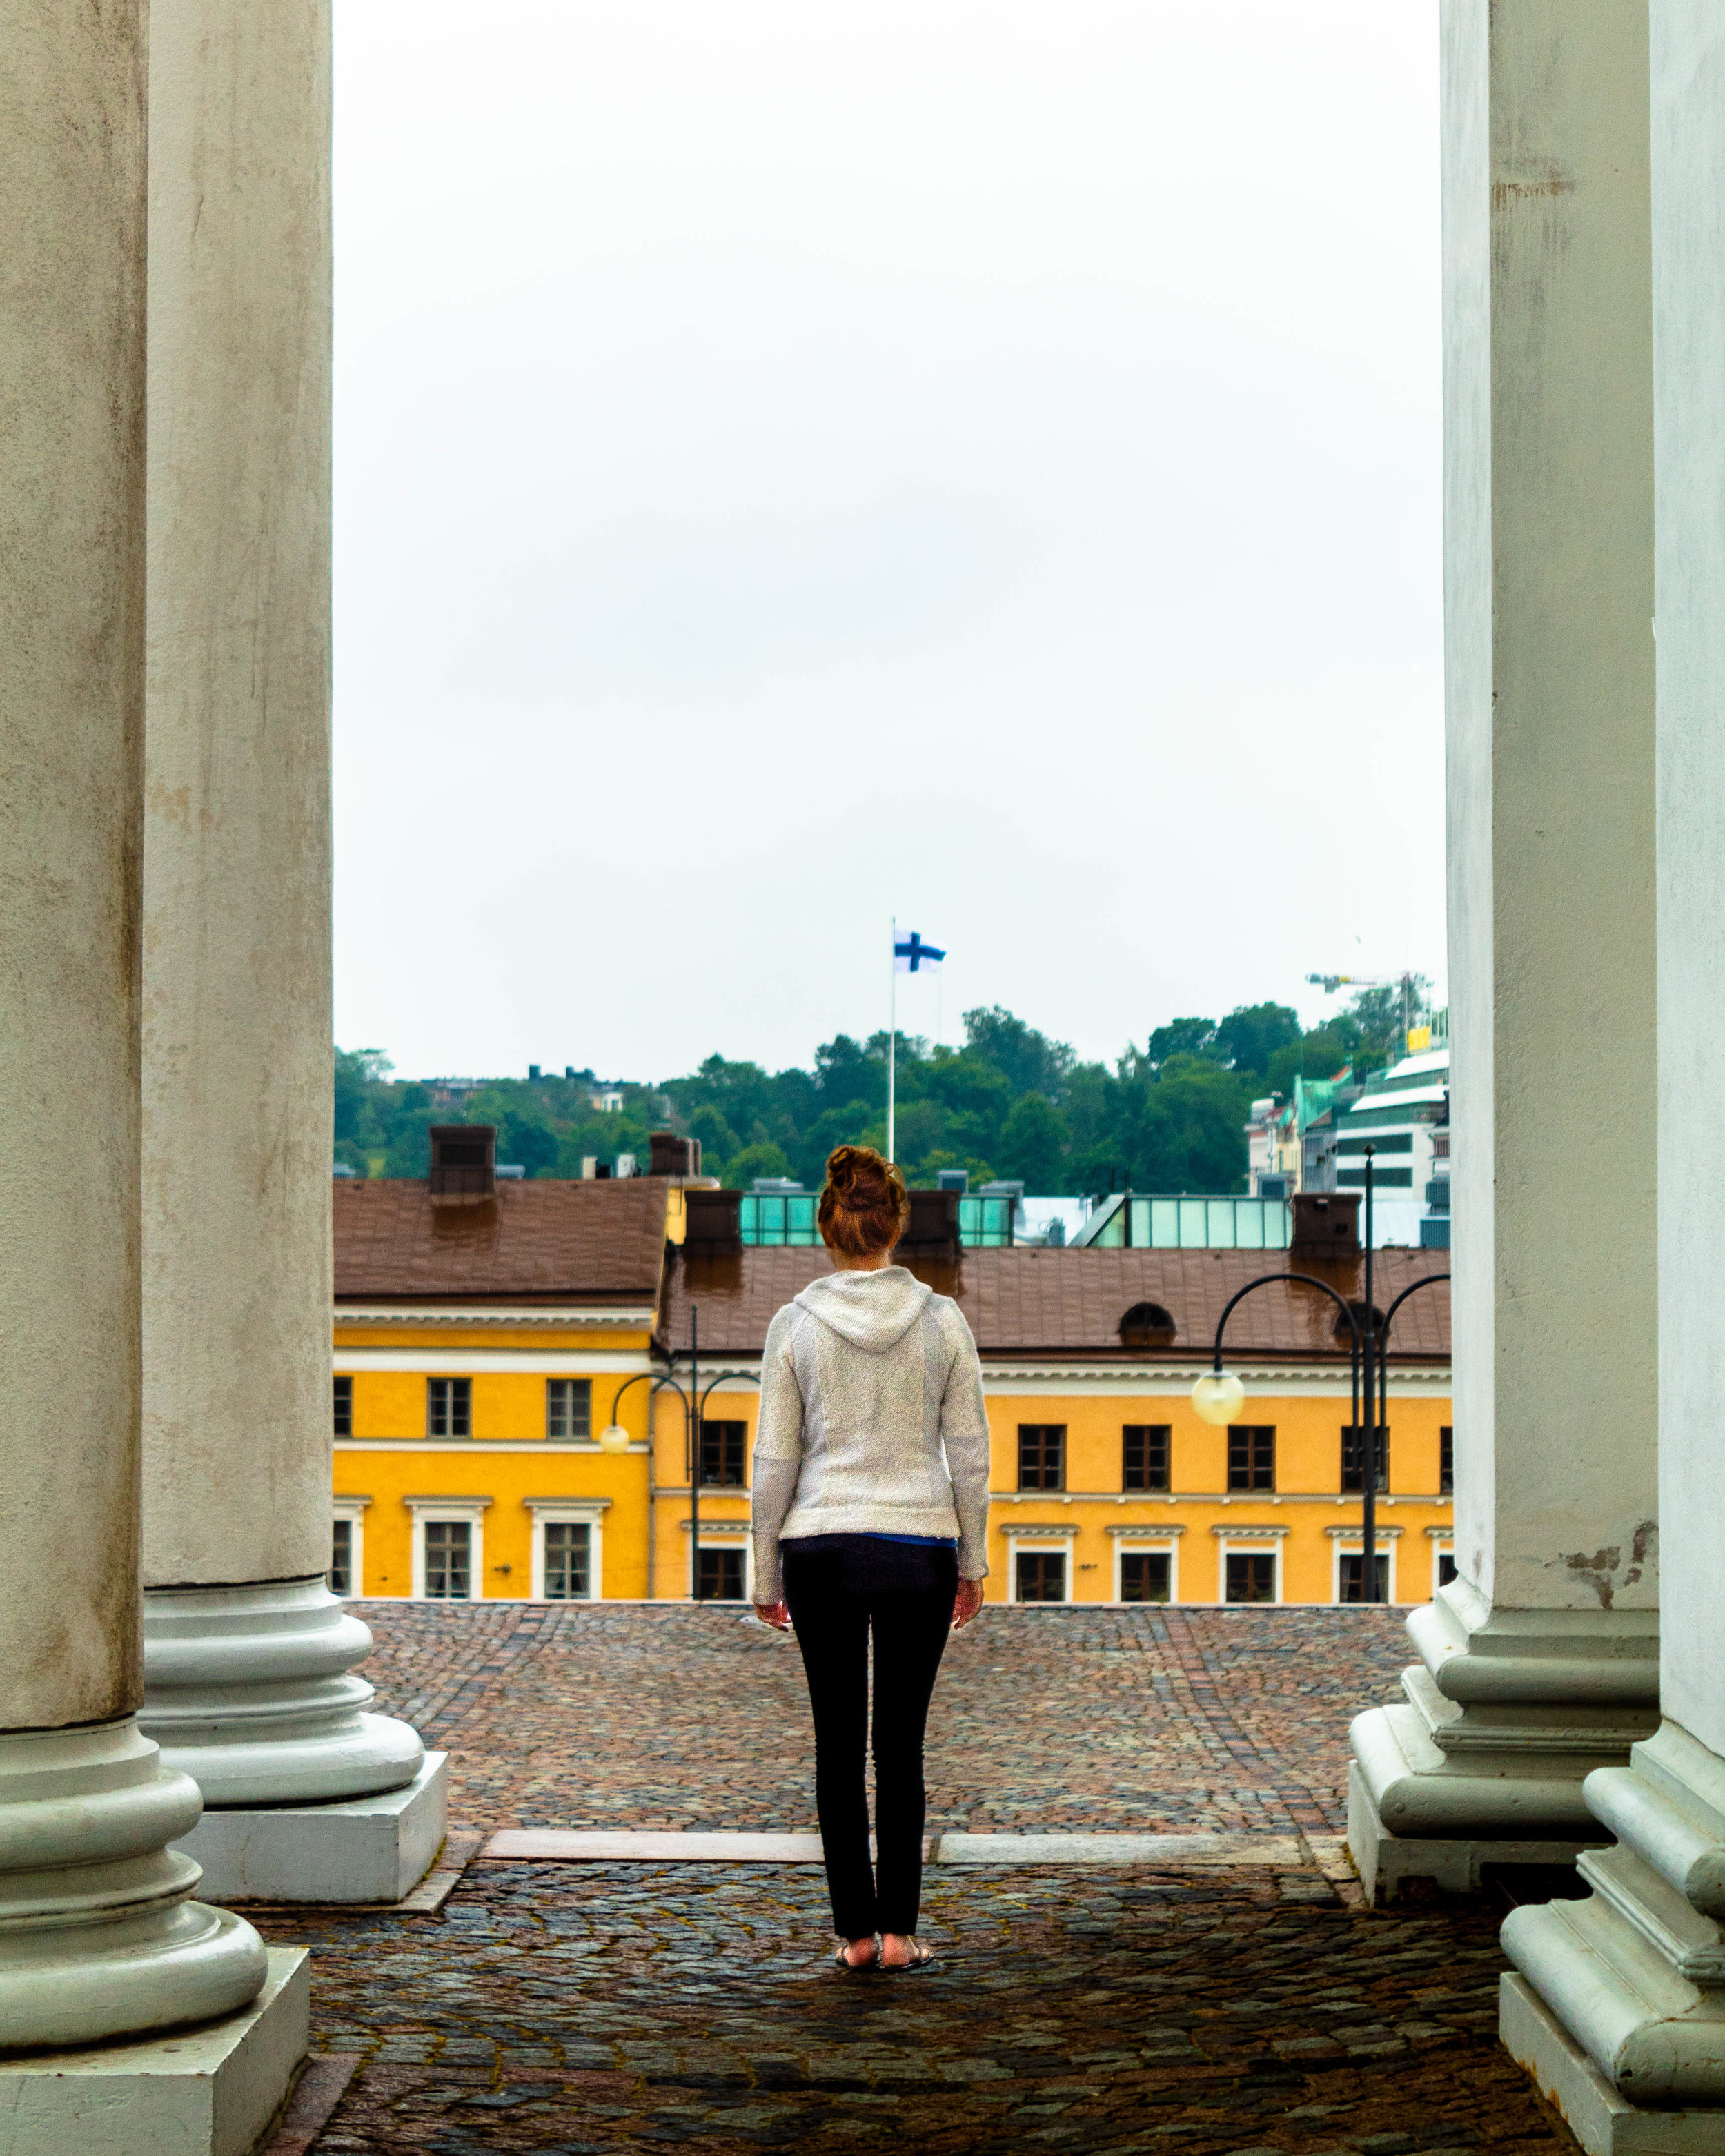 Things to do in Helsinki - Helsinki Itinerary